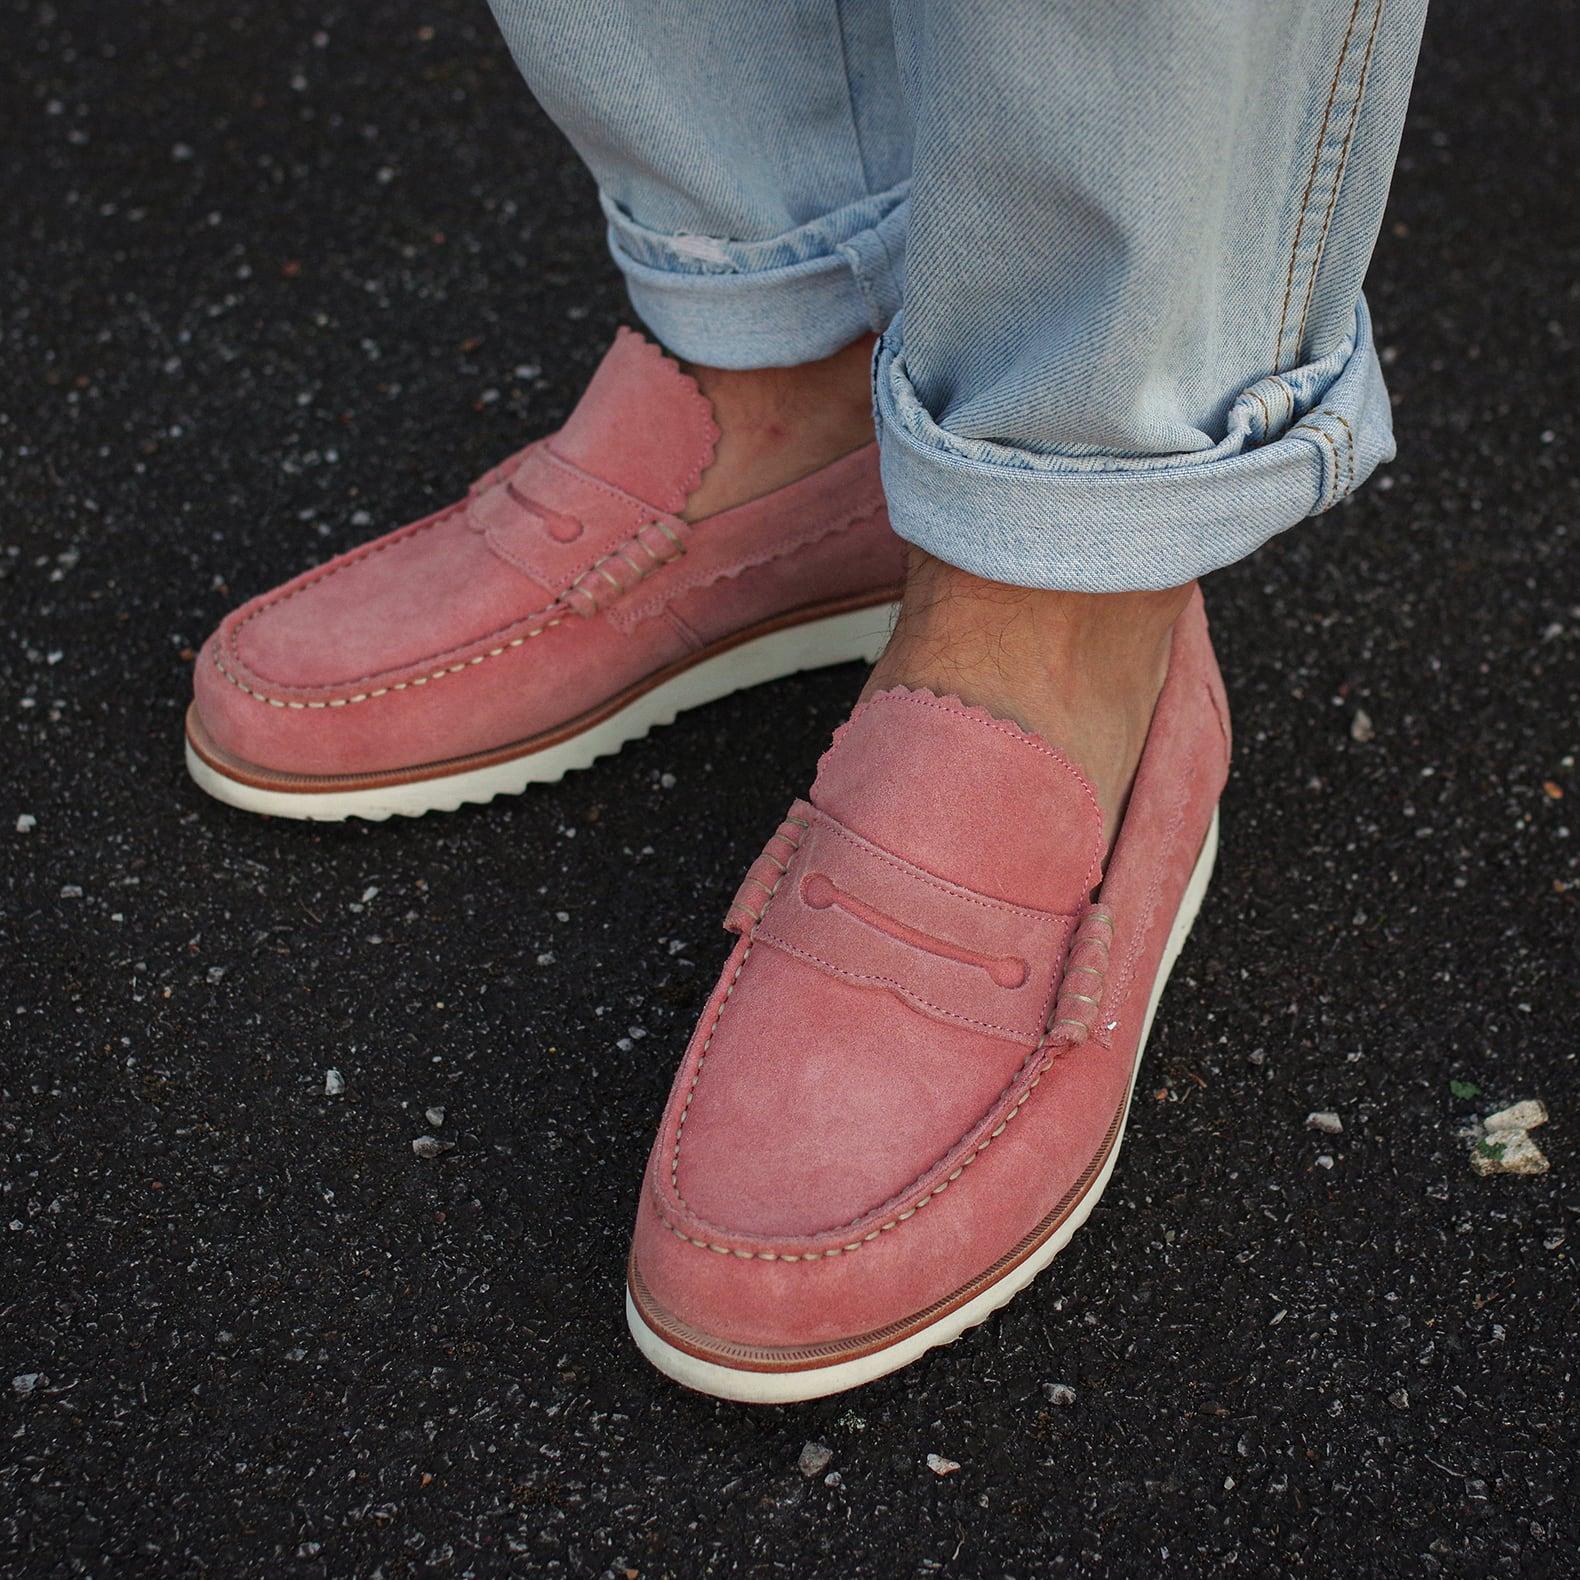 mocassins roses de la marque Grenson, forme penny loafers